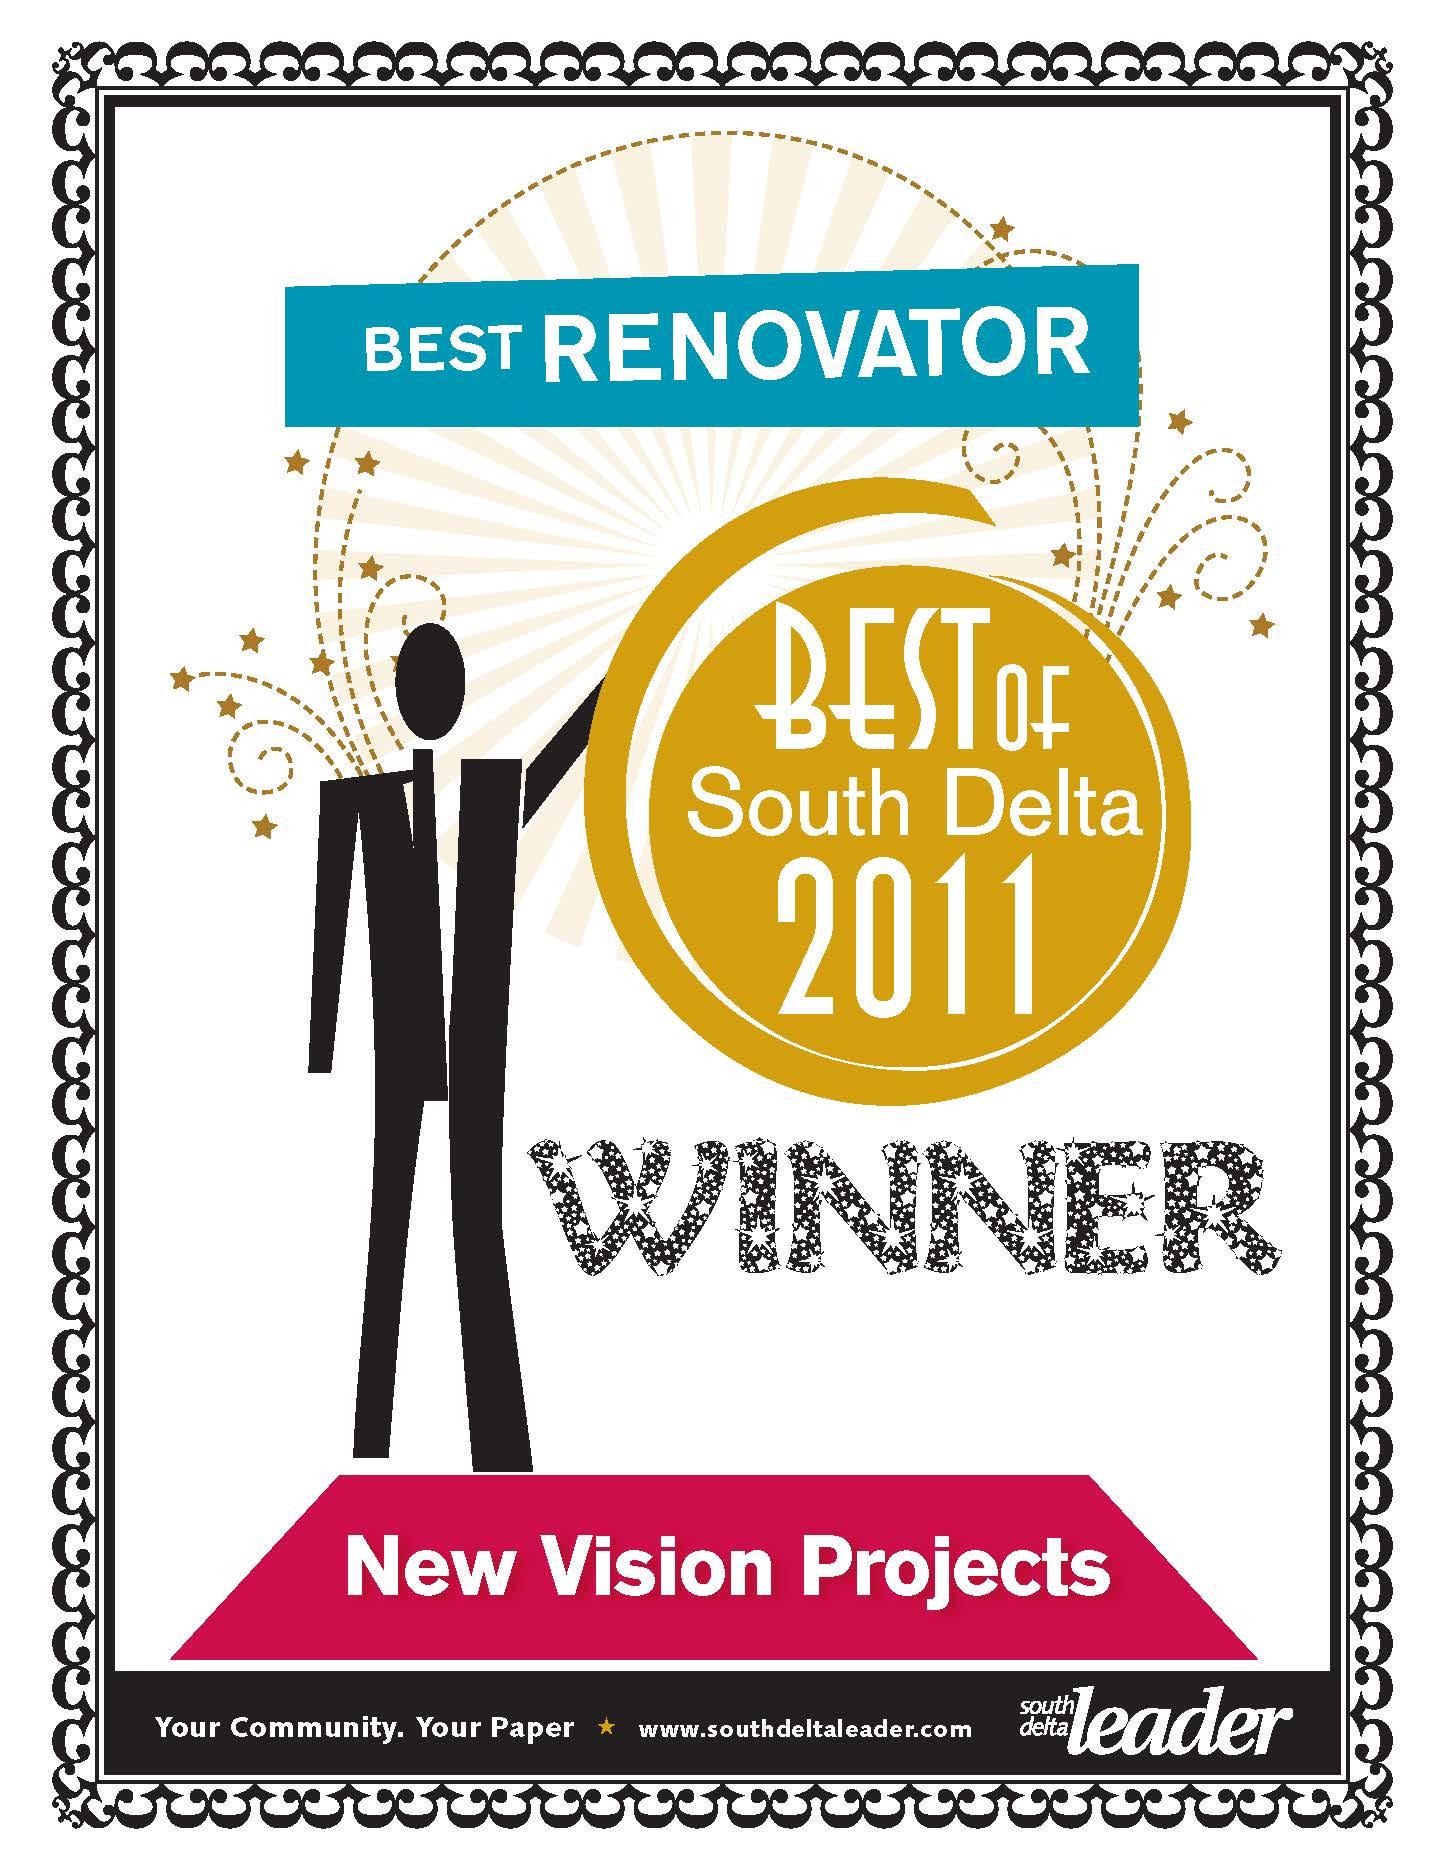 2011 South Delta Leader Readers Choice Awards – Best Renovator